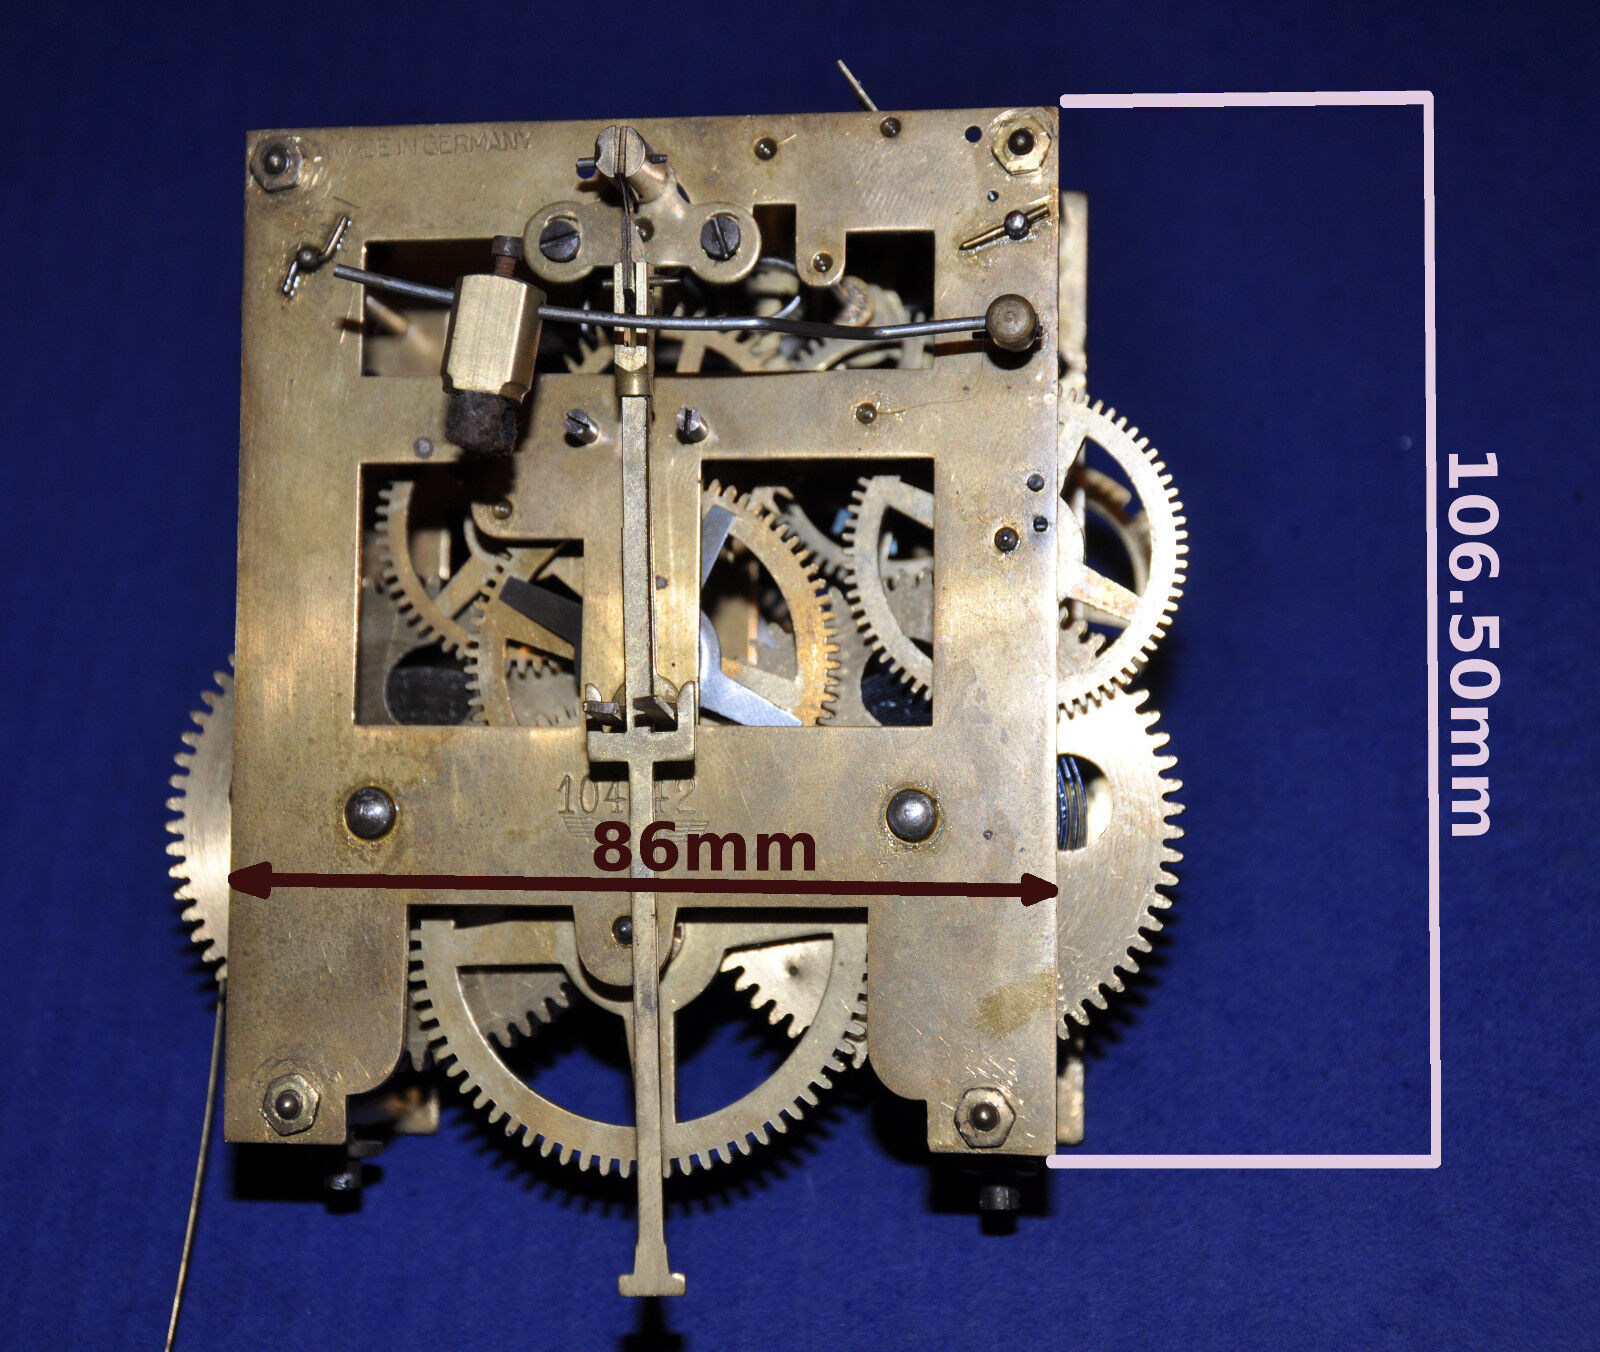 Kienzle german wall clock movement 1089 ebay for Kienzle wall clock parts